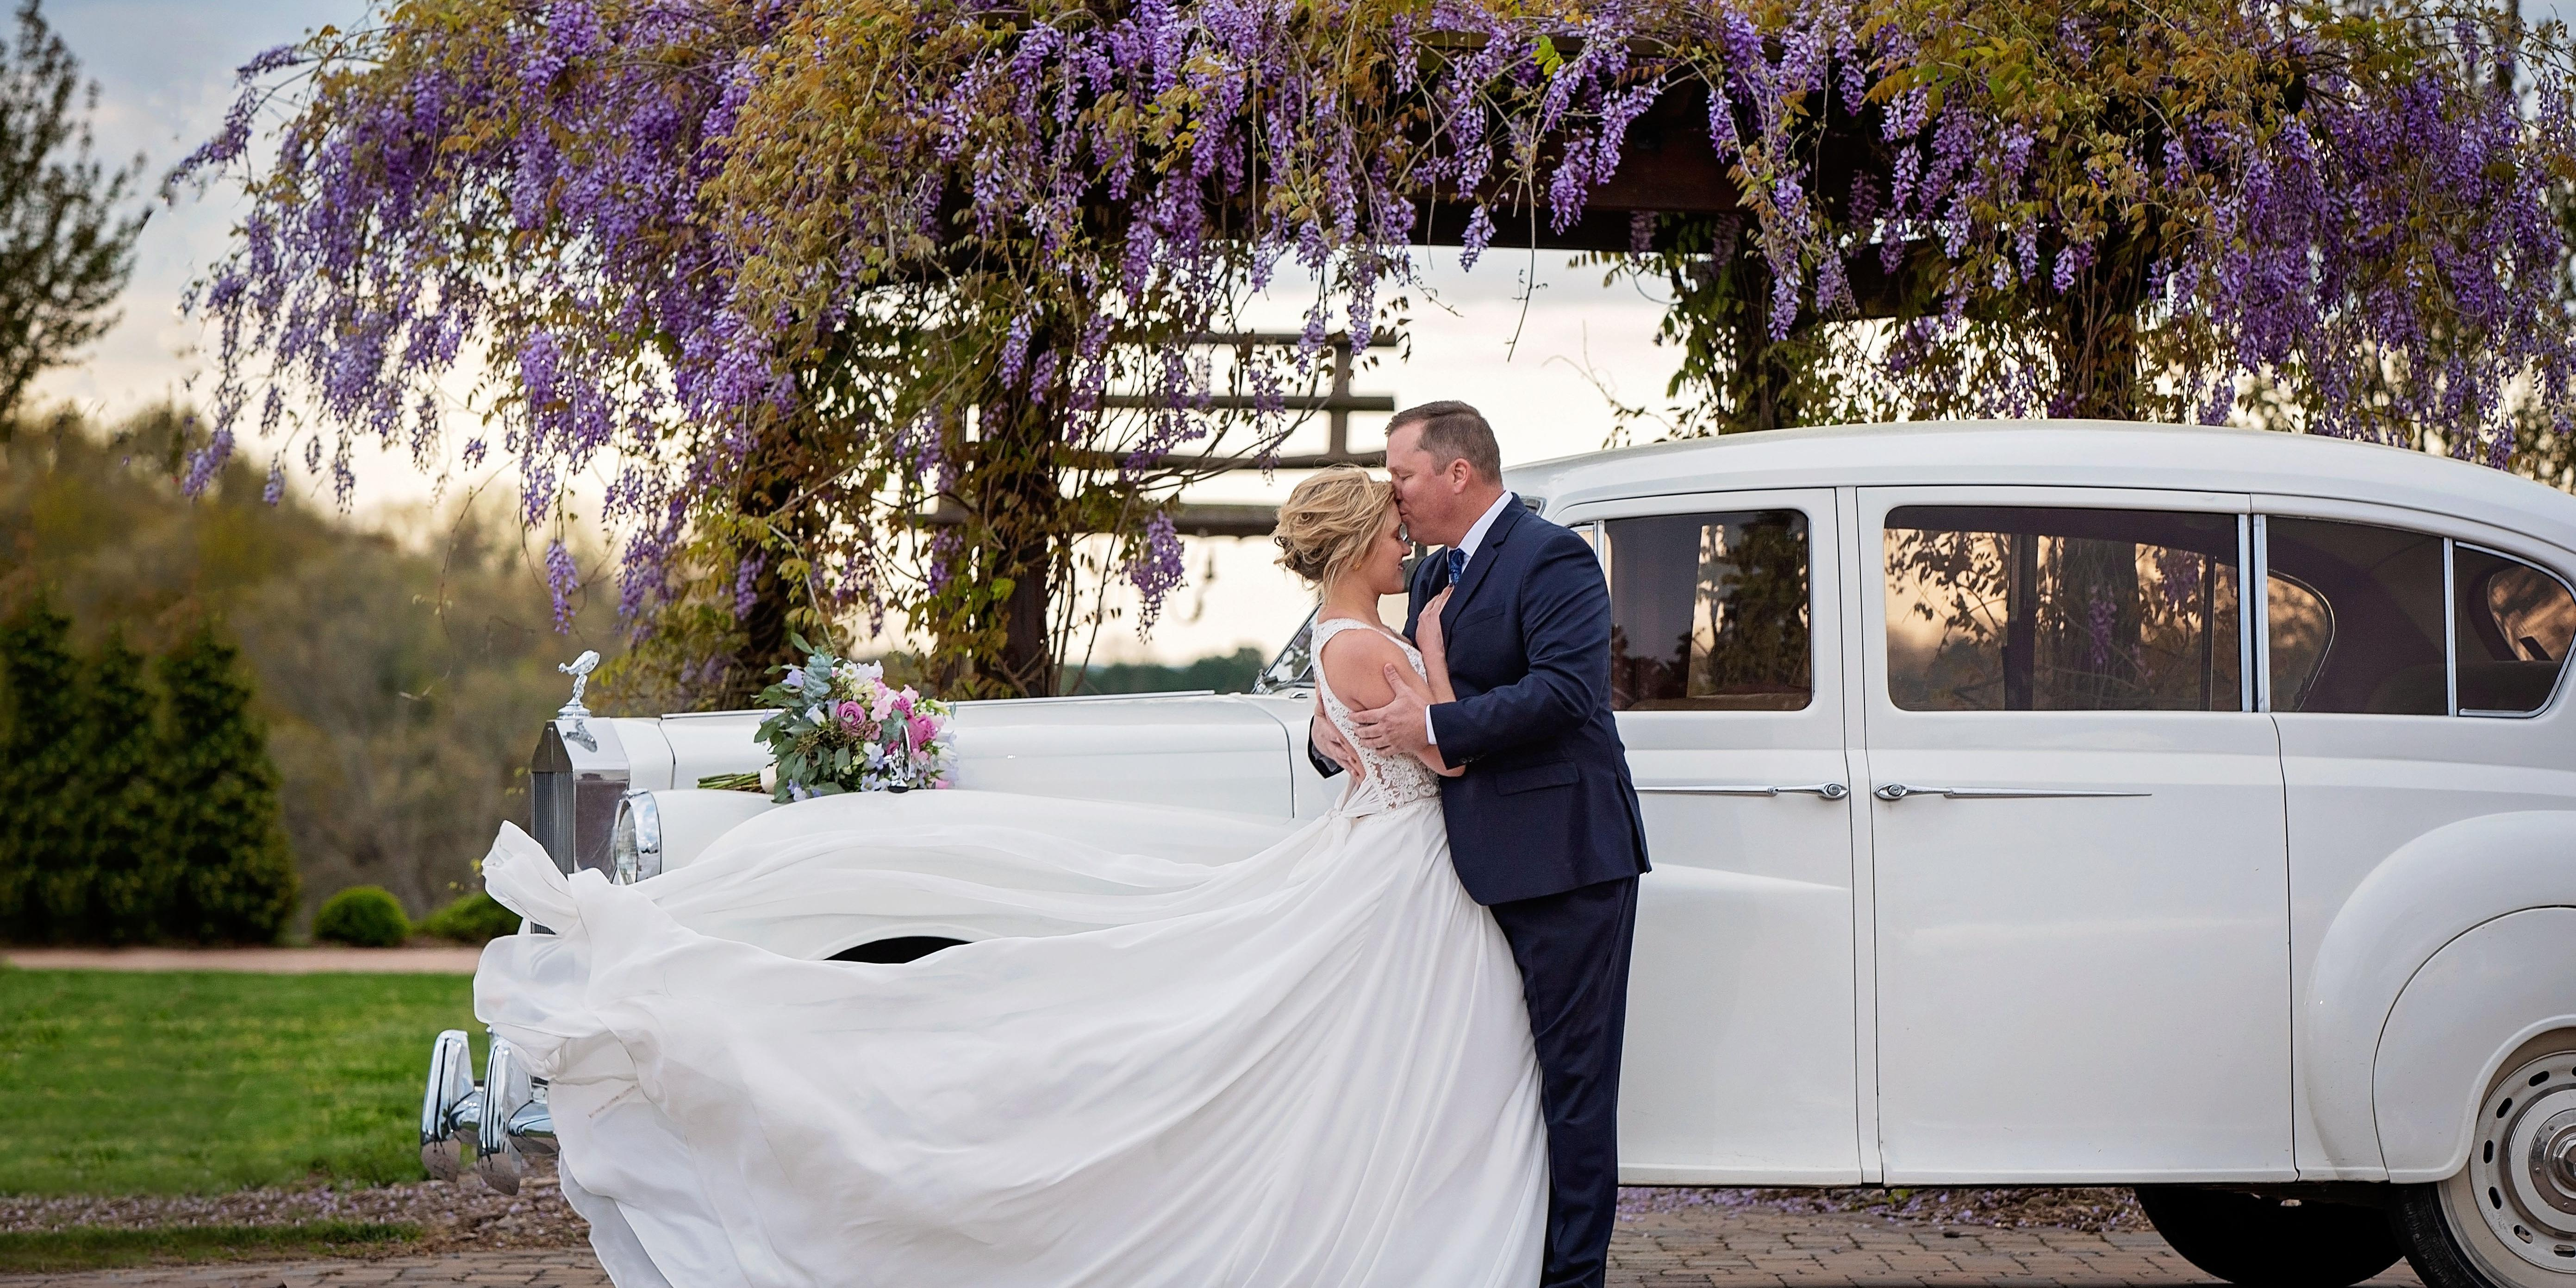 Howe Farms Wedding & Event Venue wedding Chattanooga